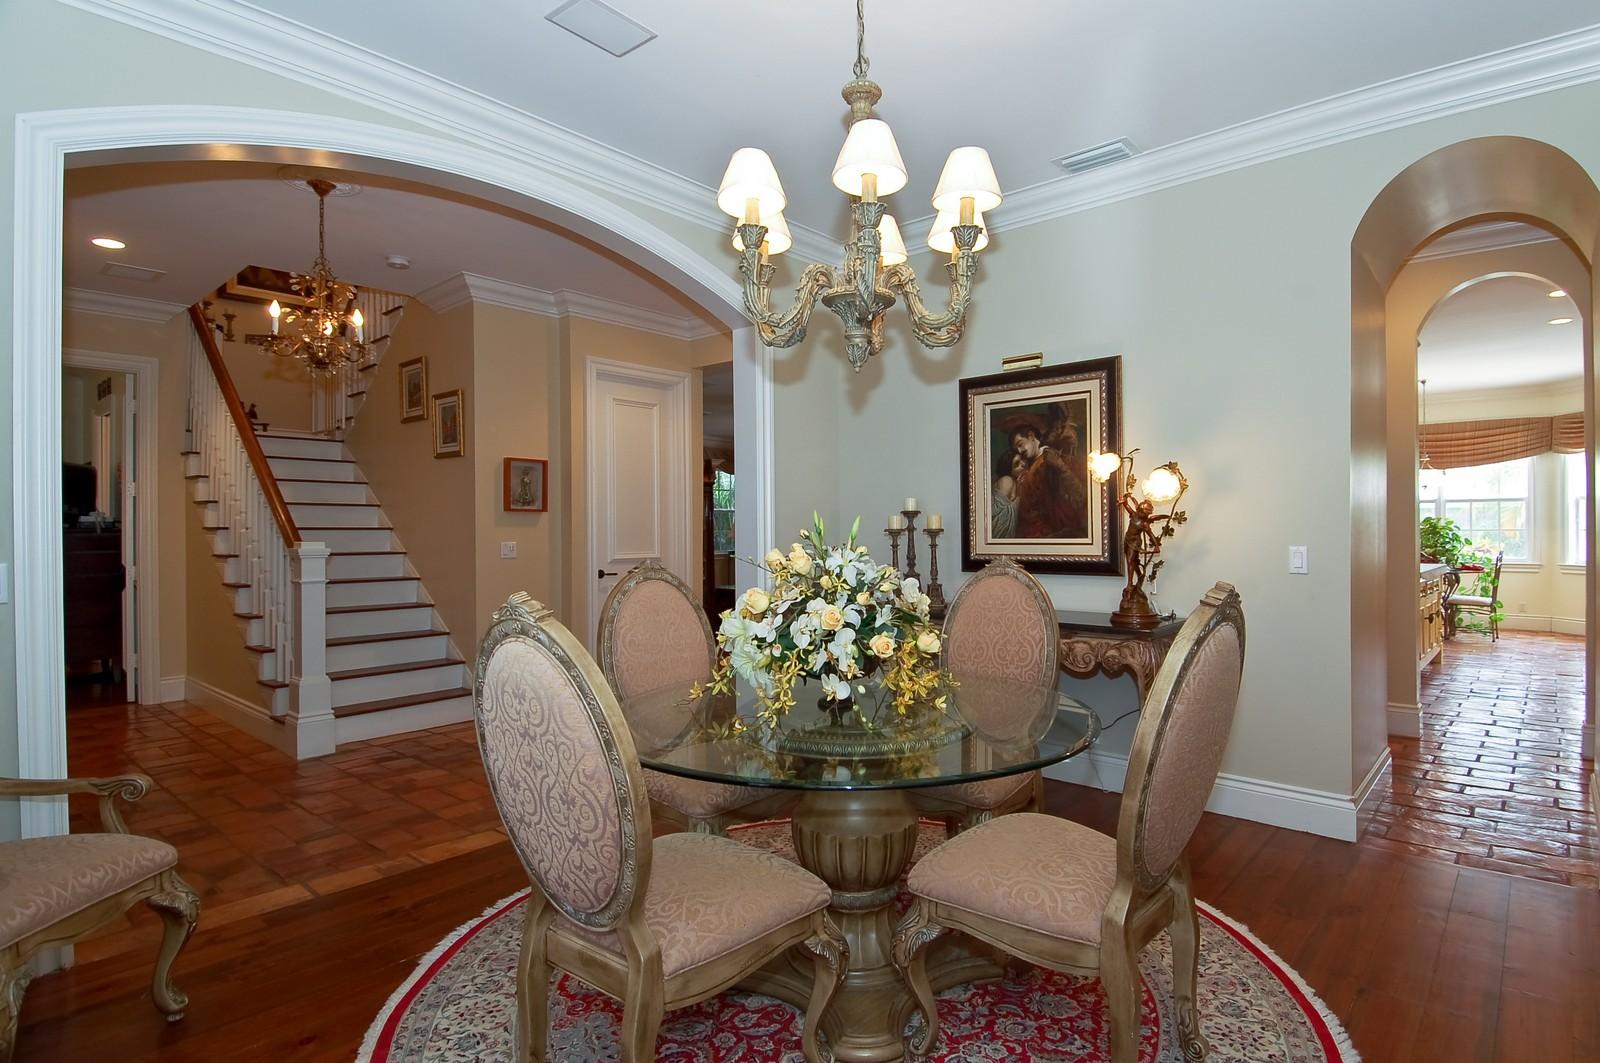 Real Estate Photography - 355 NE 3rd Ct, Boca Raton, FL, 33432 - Dining Room